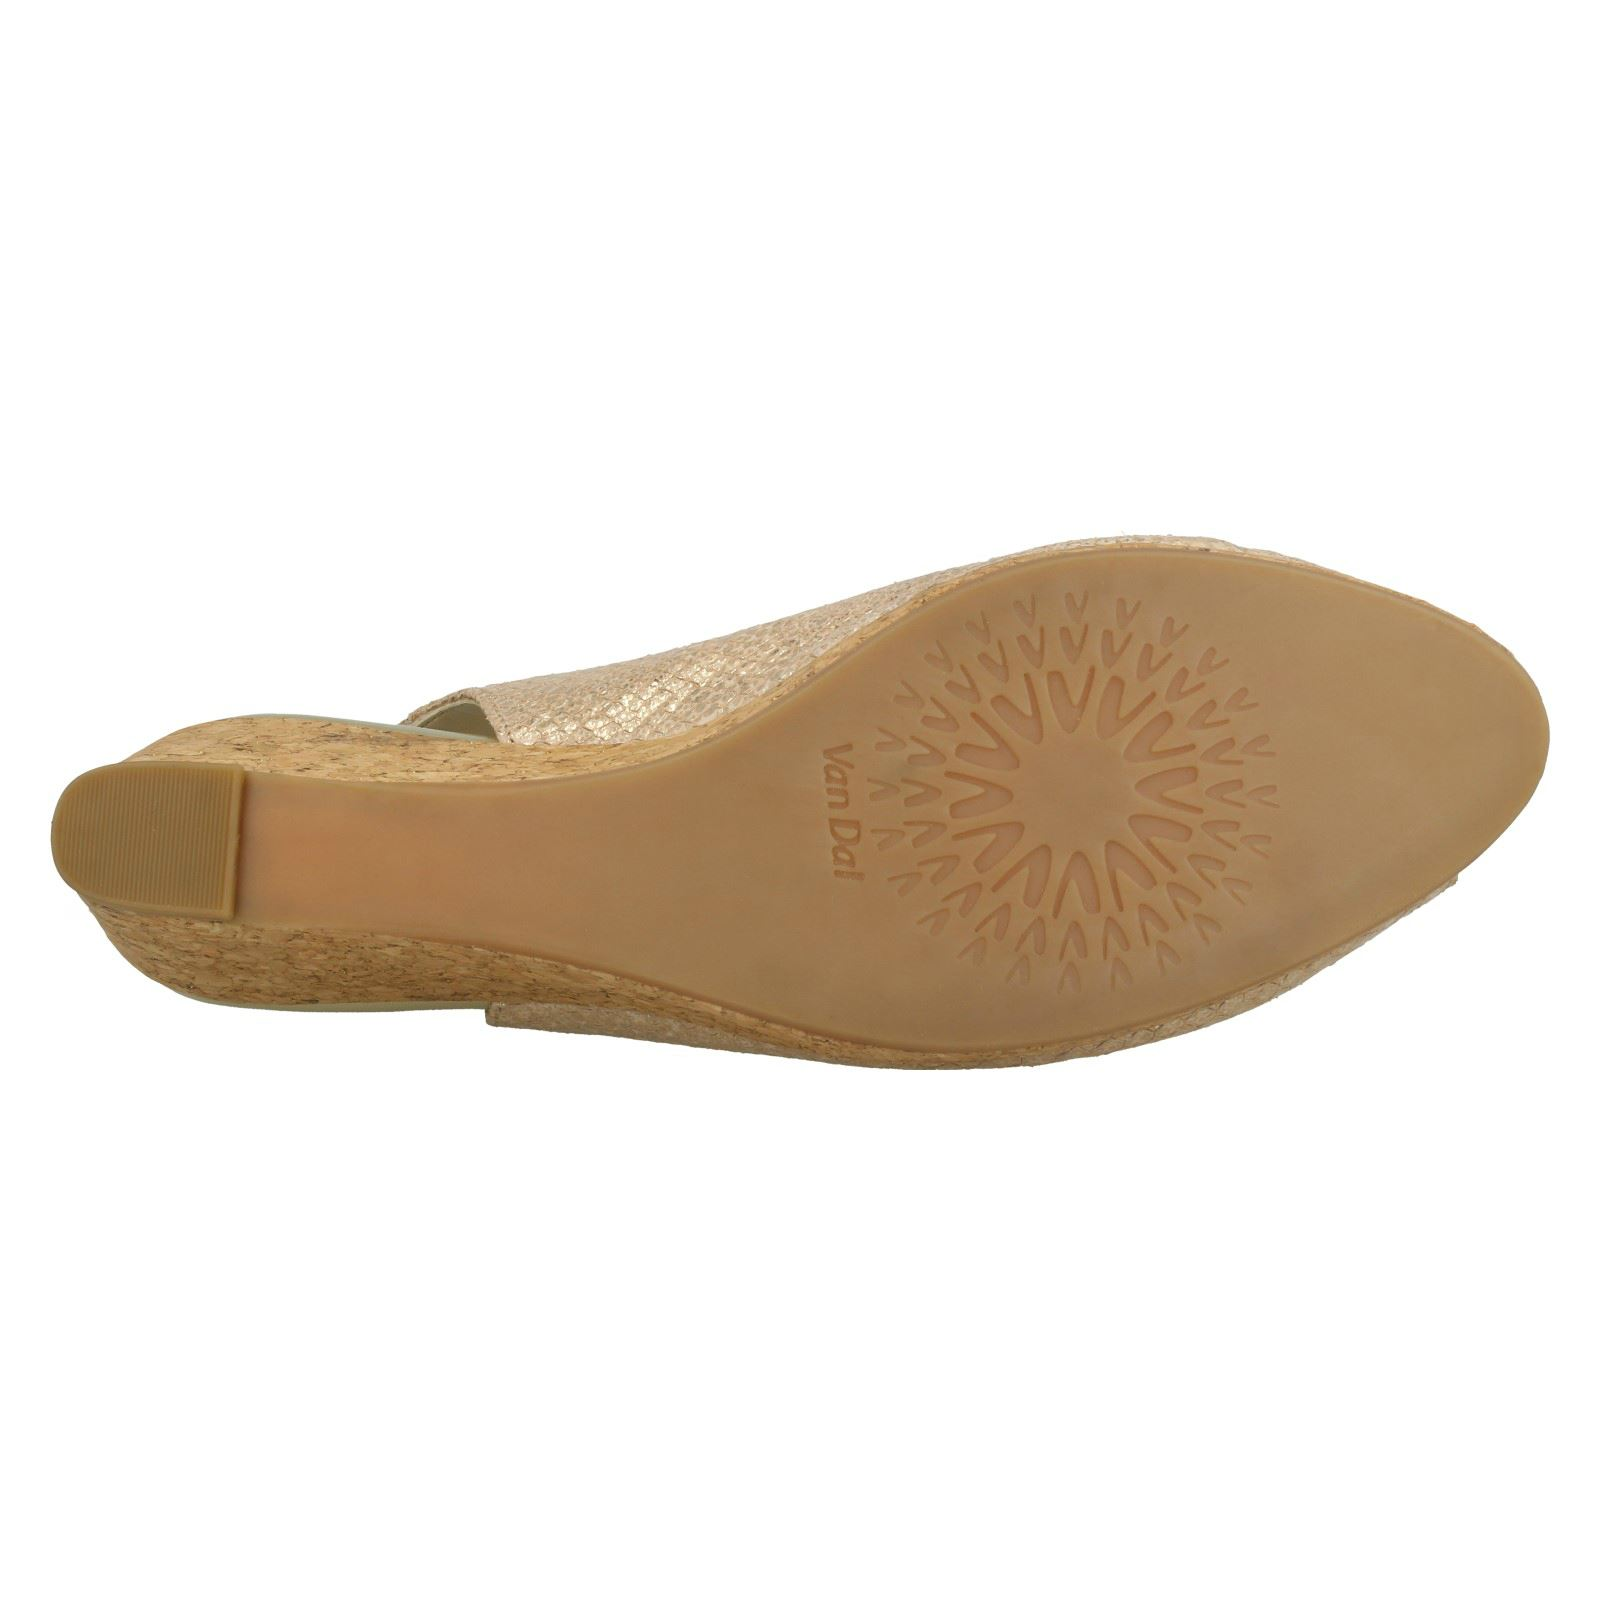 Ladies-Van-Dal-Cork-Wedge-Sandals-039-Gable-039 thumbnail 10